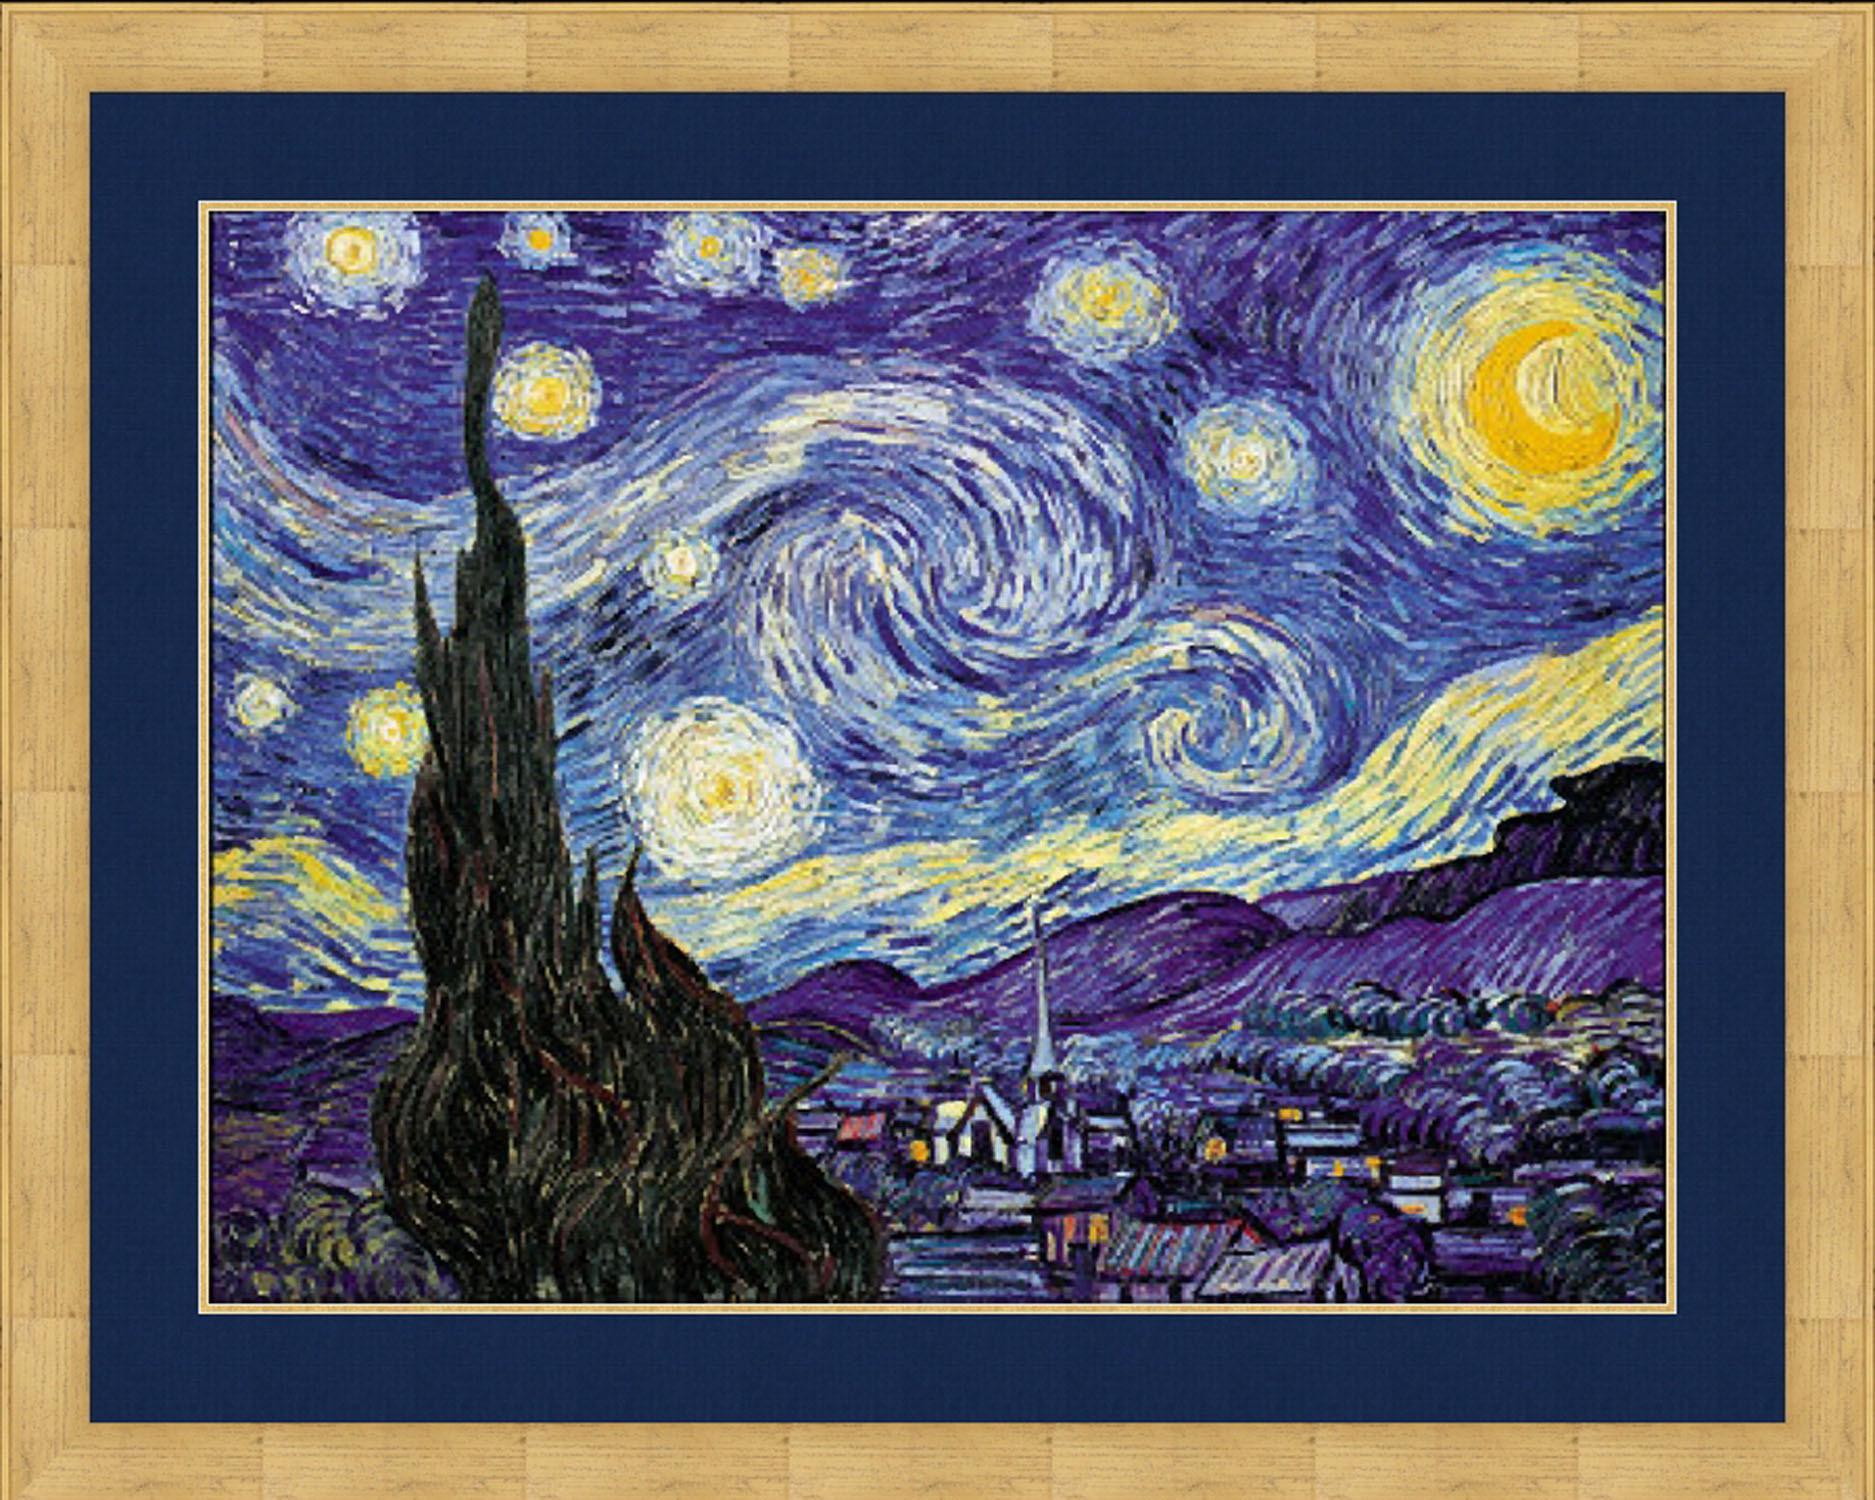 c7673194451b0980f2b8_starry_night_van_gogh.jpg